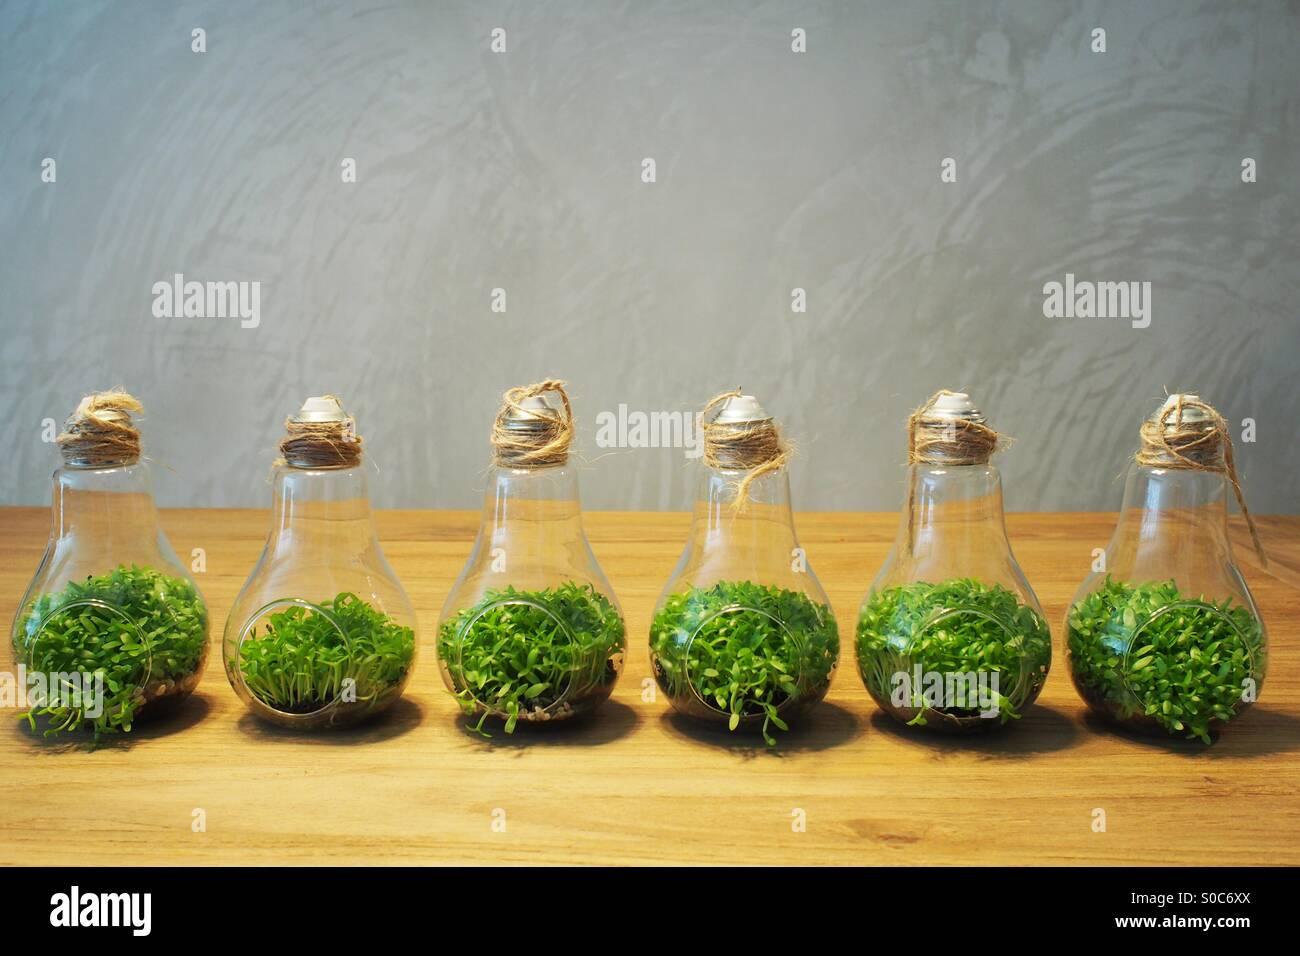 Bulb plants. - Stock Image